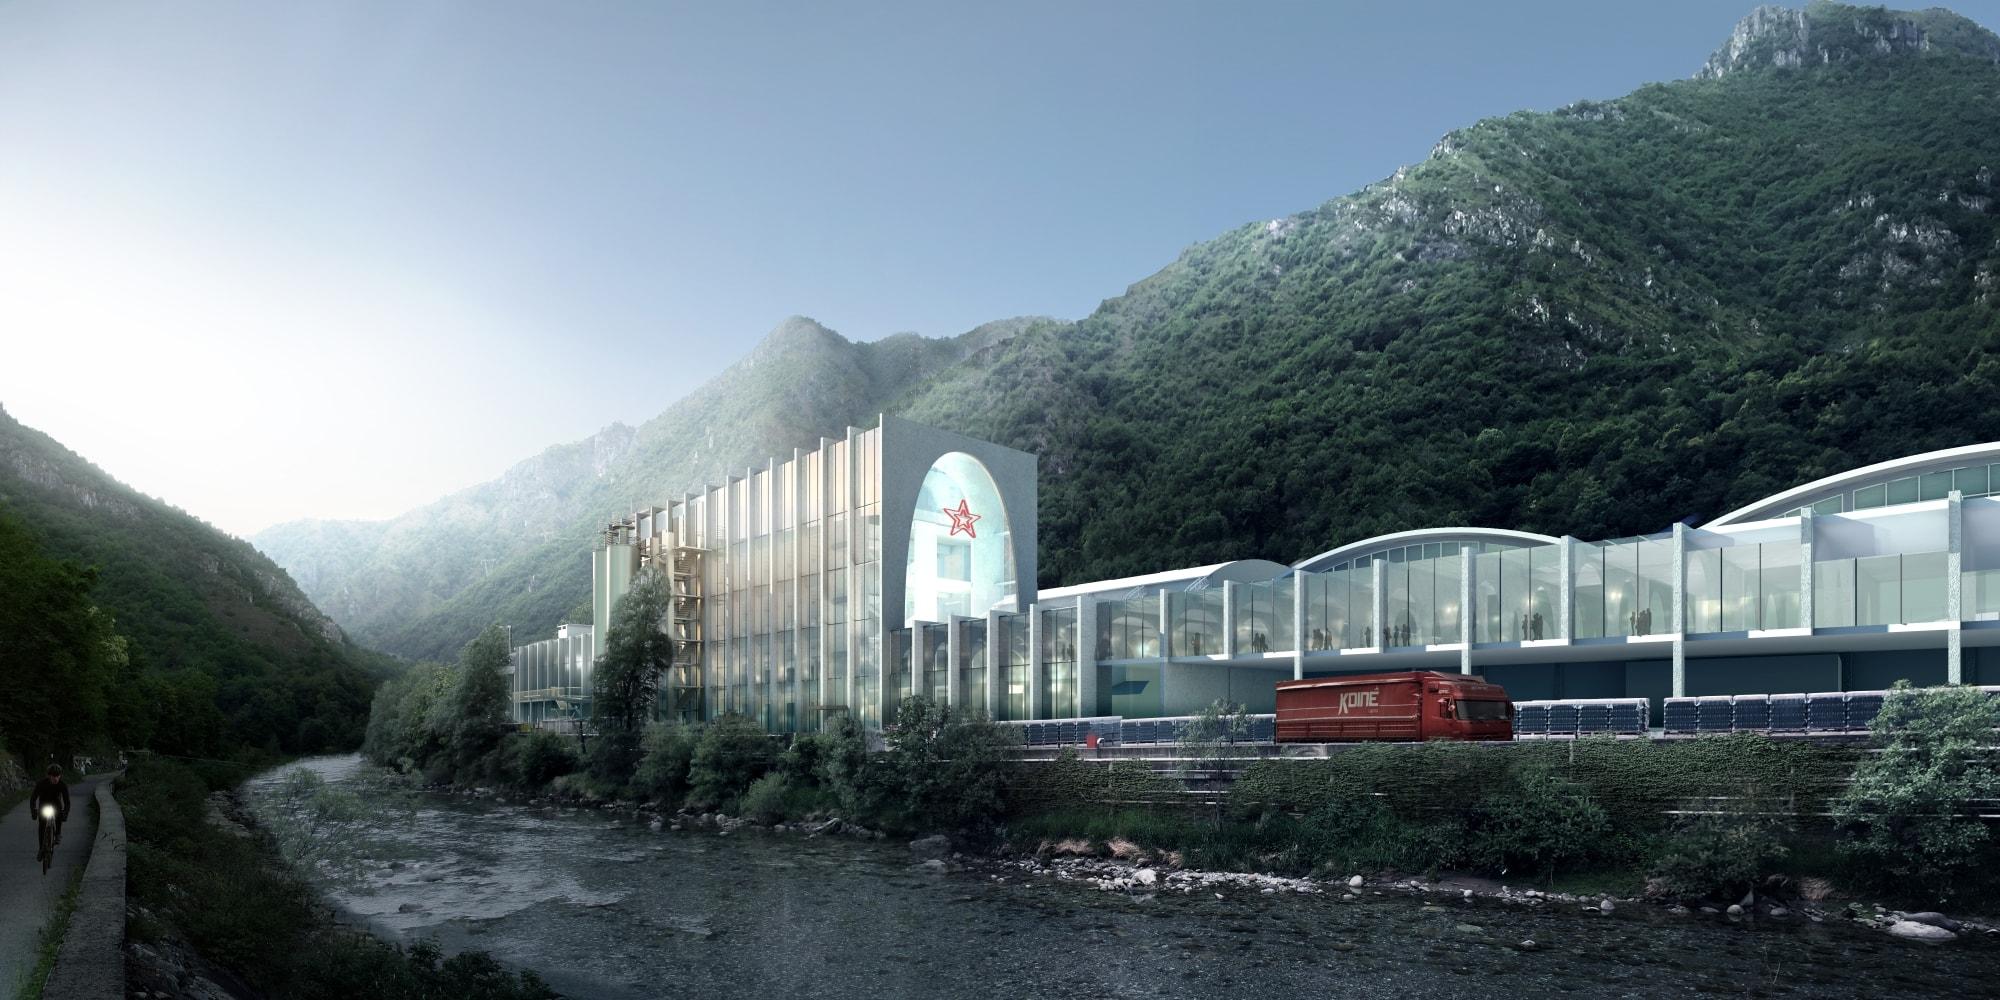 san pellegrino flagship factory featured